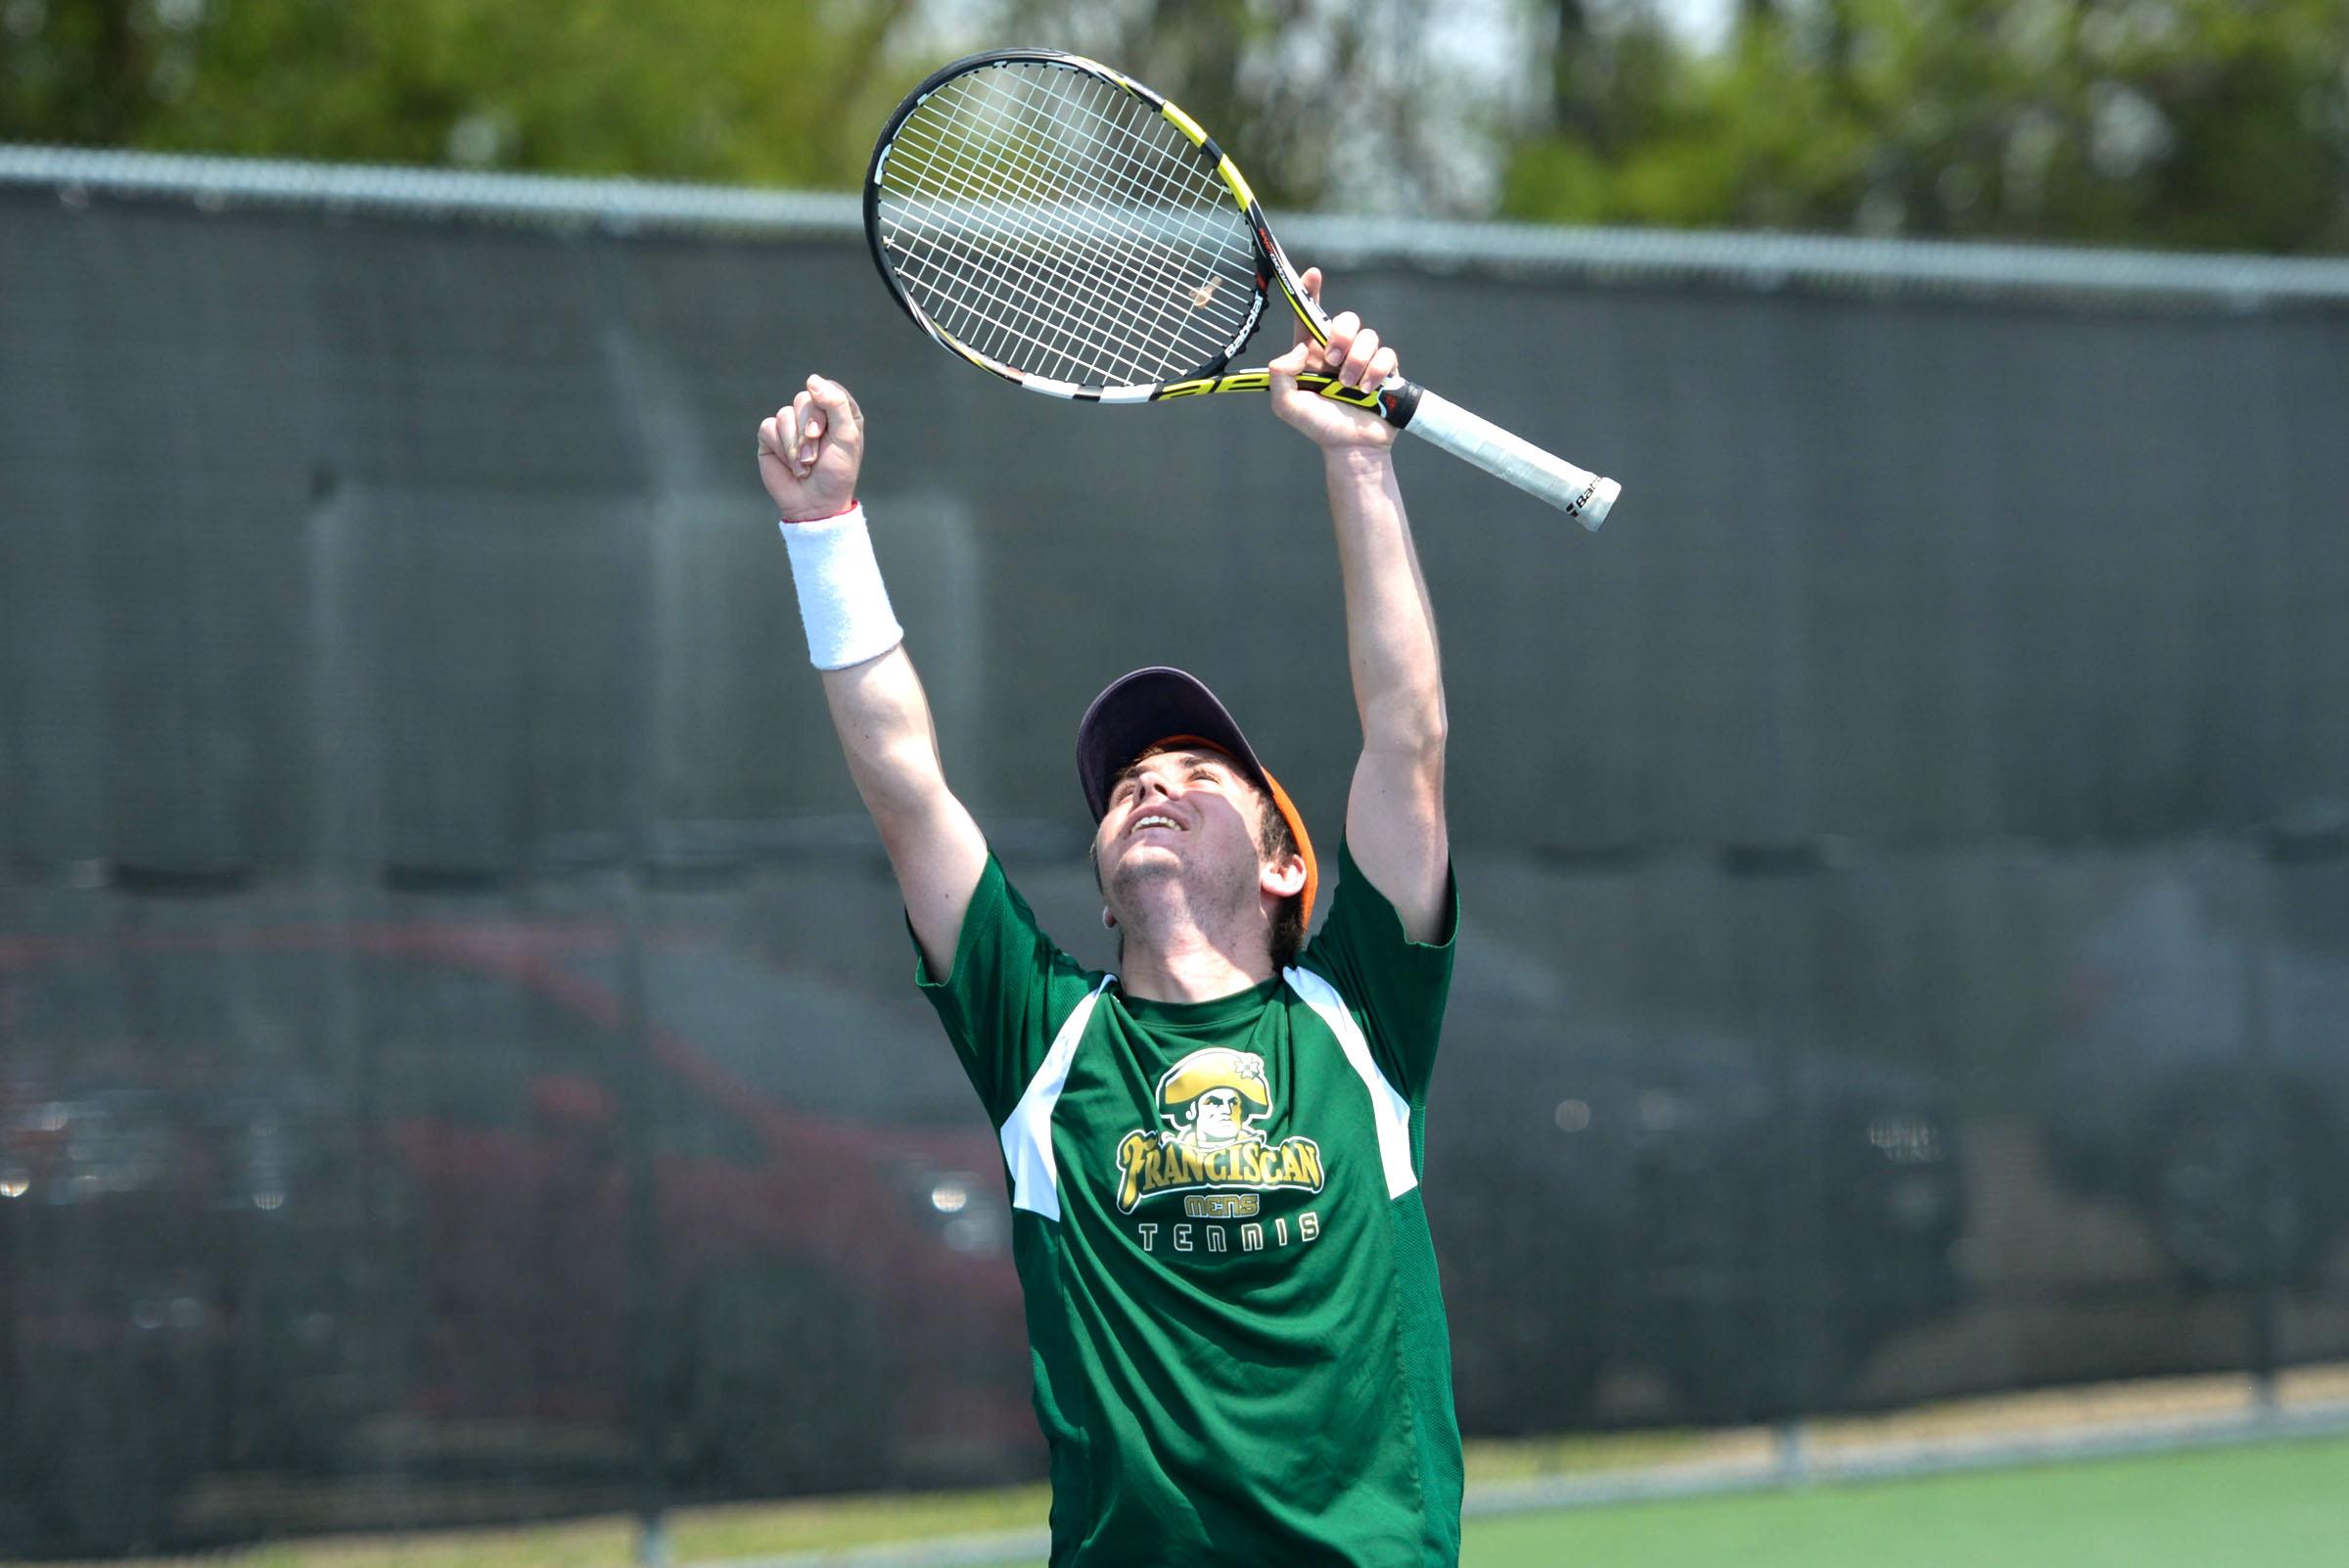 Mens Tennis - Victory